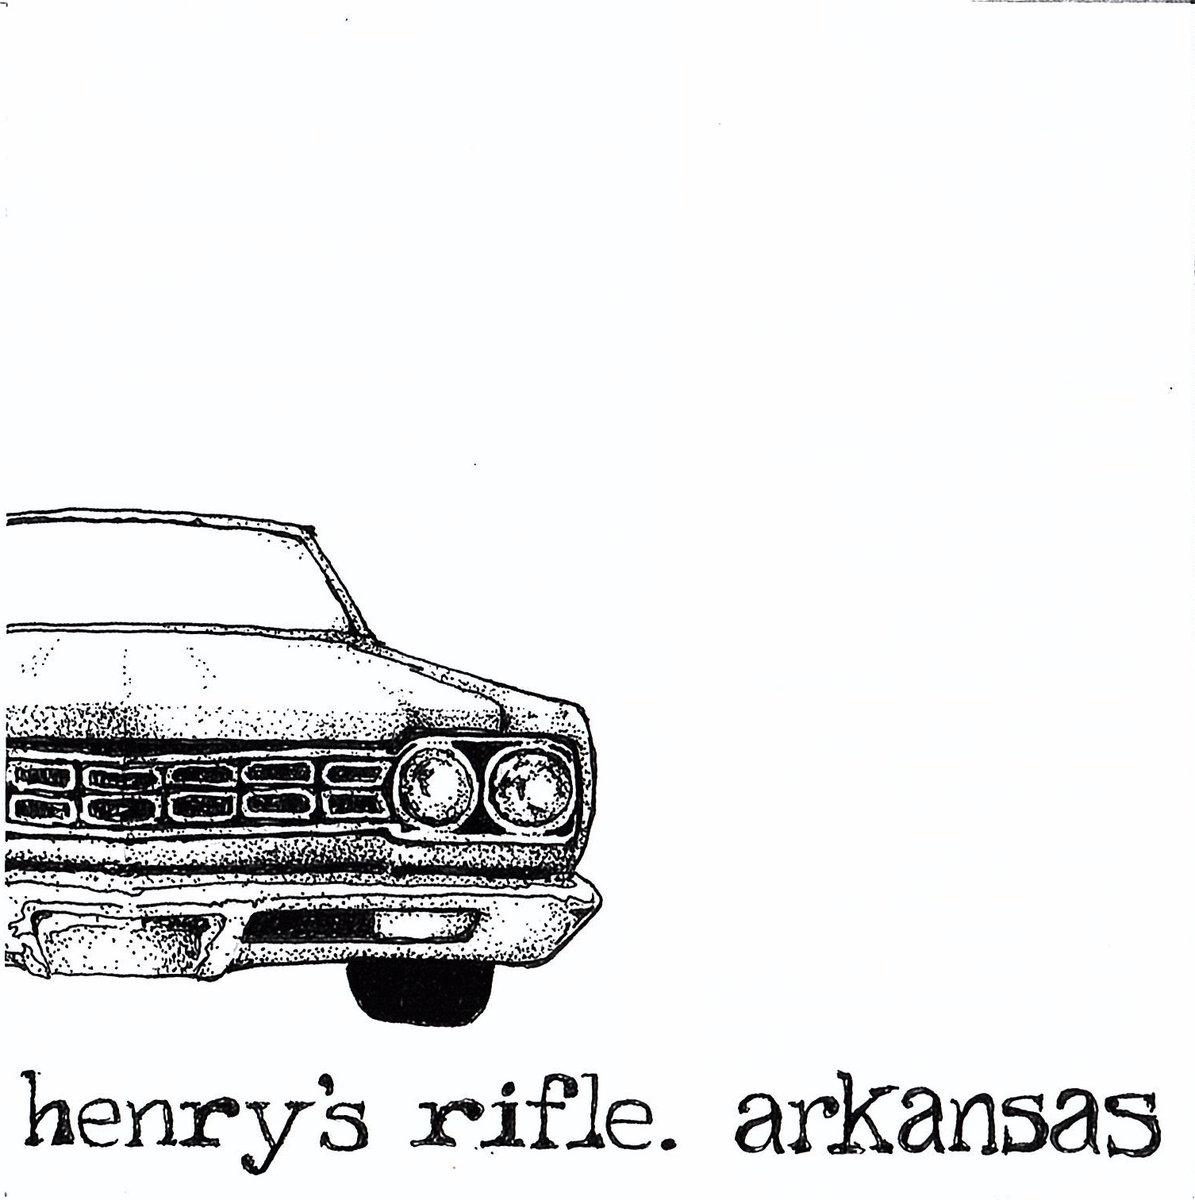 henrys rifle